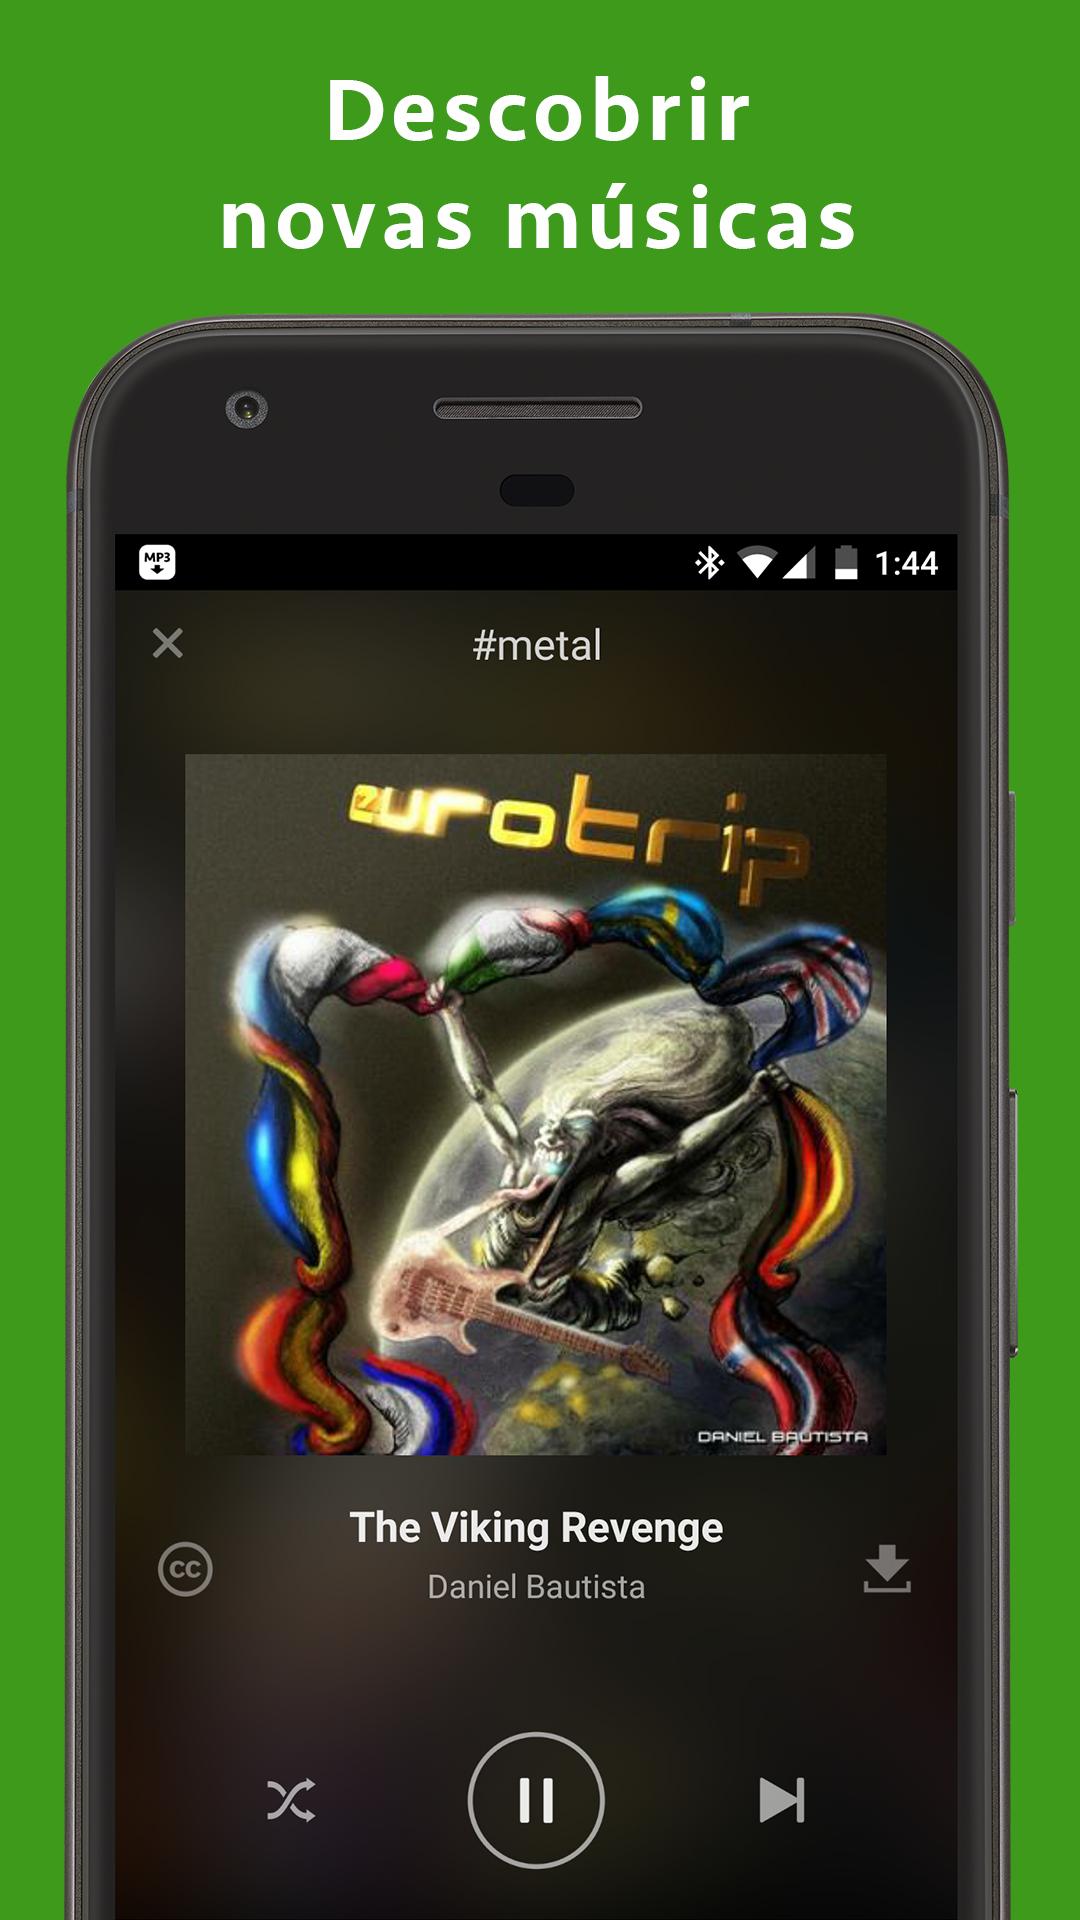 MP3 Hunter – Baixar Músicas MP3: Amazon.com.br